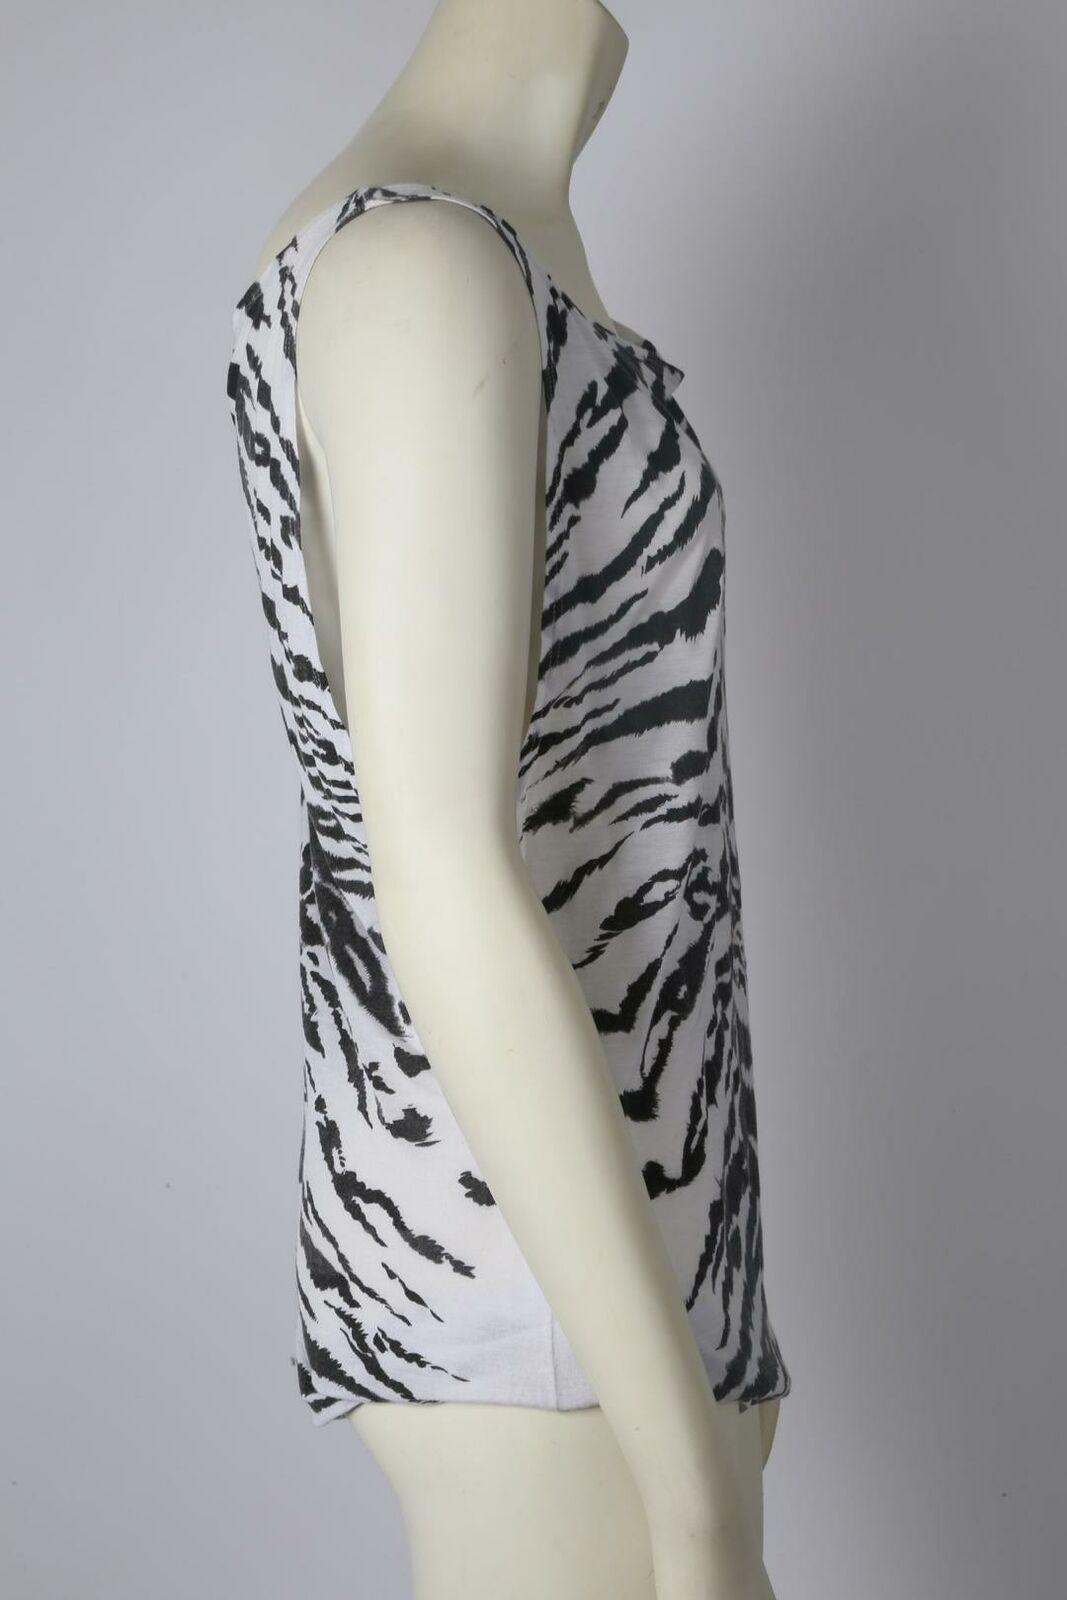 SAINT LAURENT Zebra Print Sleeveless Top Size S - image 4